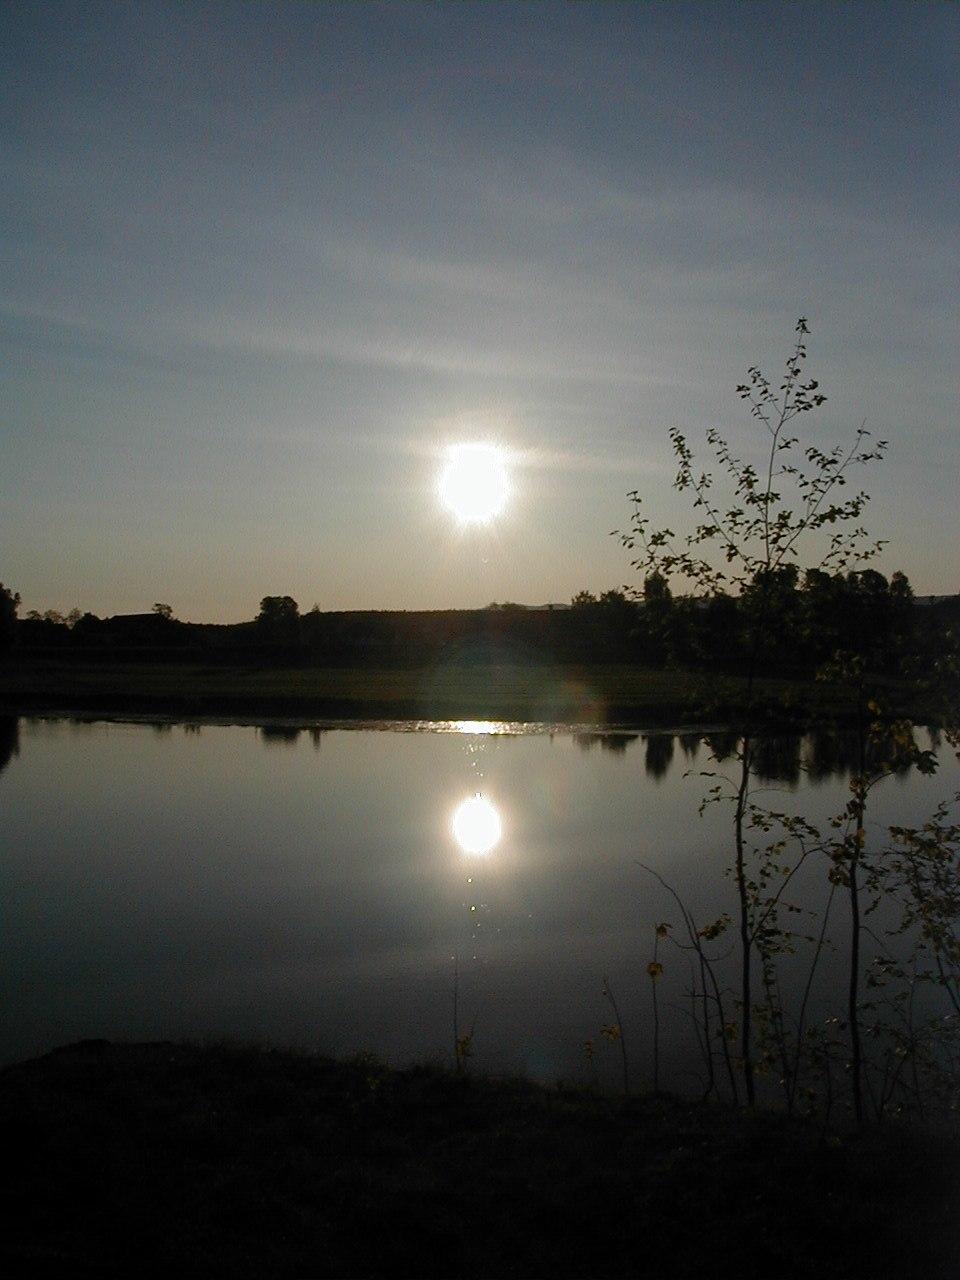 Solar eclipse Ringerike 2003